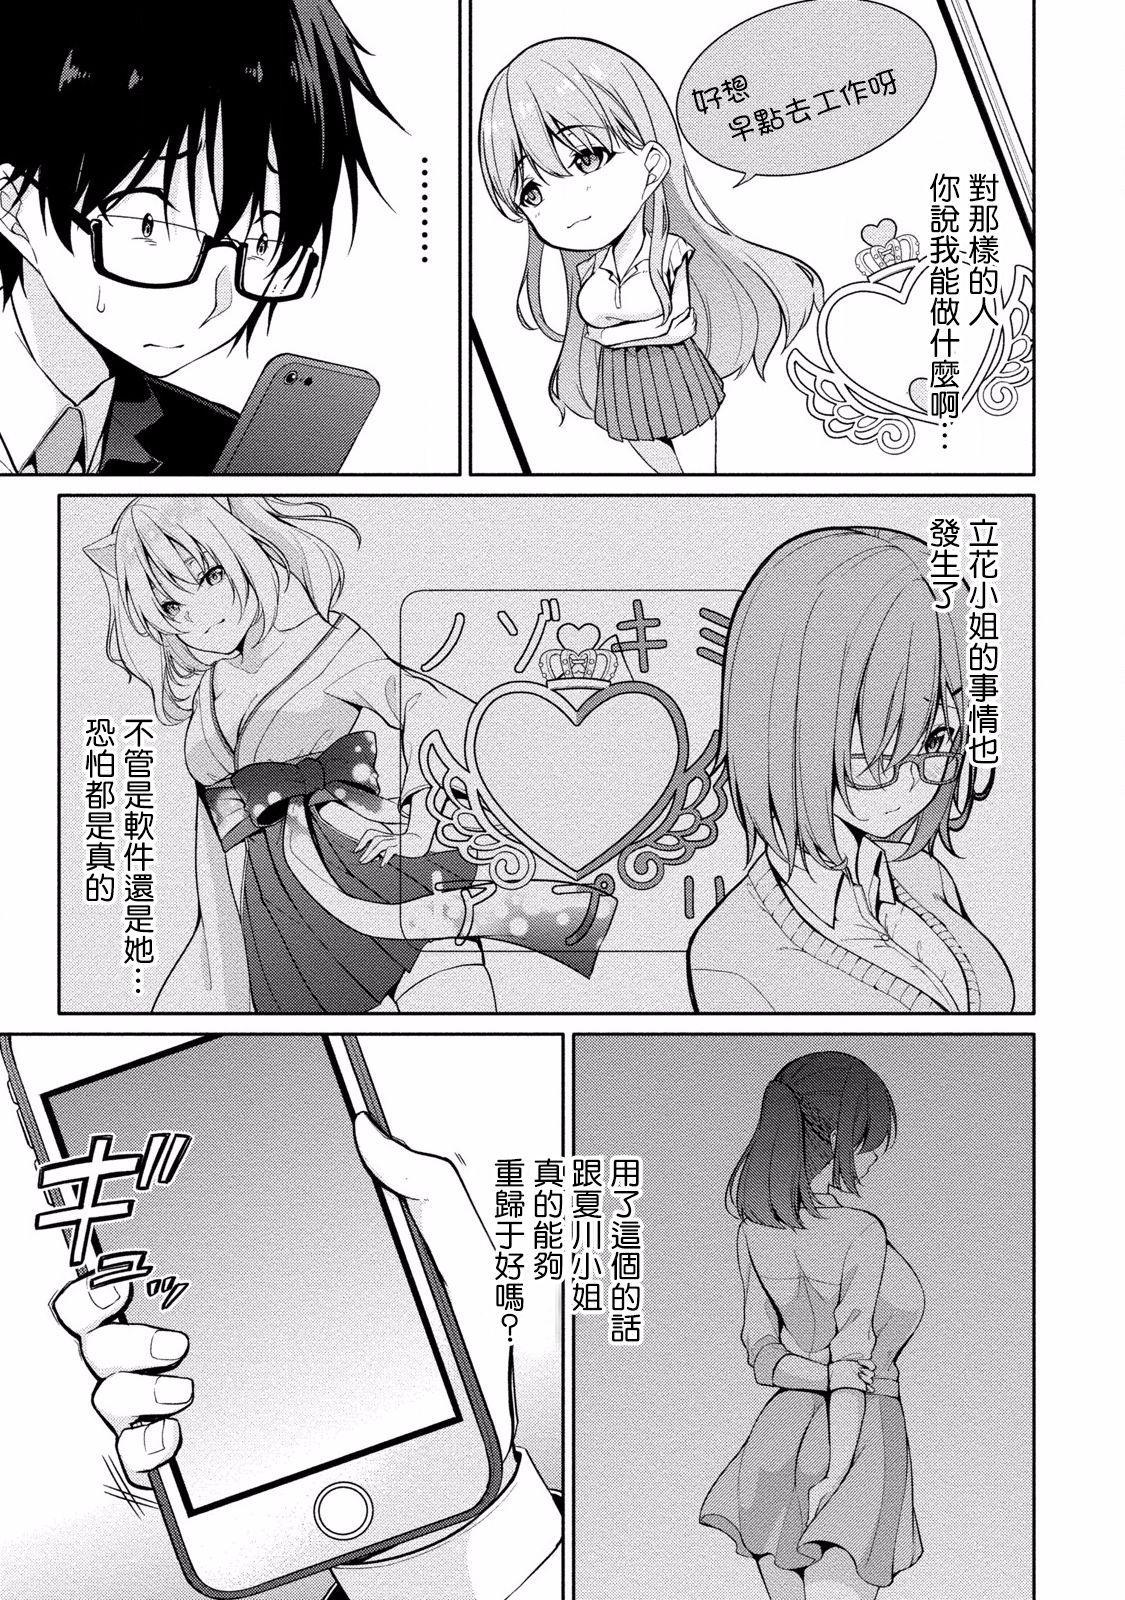 [Yukino] Satou-kun wa Miteiru. ~Kami-sama Appli de Onnanoko no Kokoro o Nozoitara Do XX datta~ Ch. 2 | 佐藤君正在偷窥。~用神大人的APP偷窥女孩子的内心却发现原来是抖XX~02话 [Chinese] [前线作♂战♀基地] 6